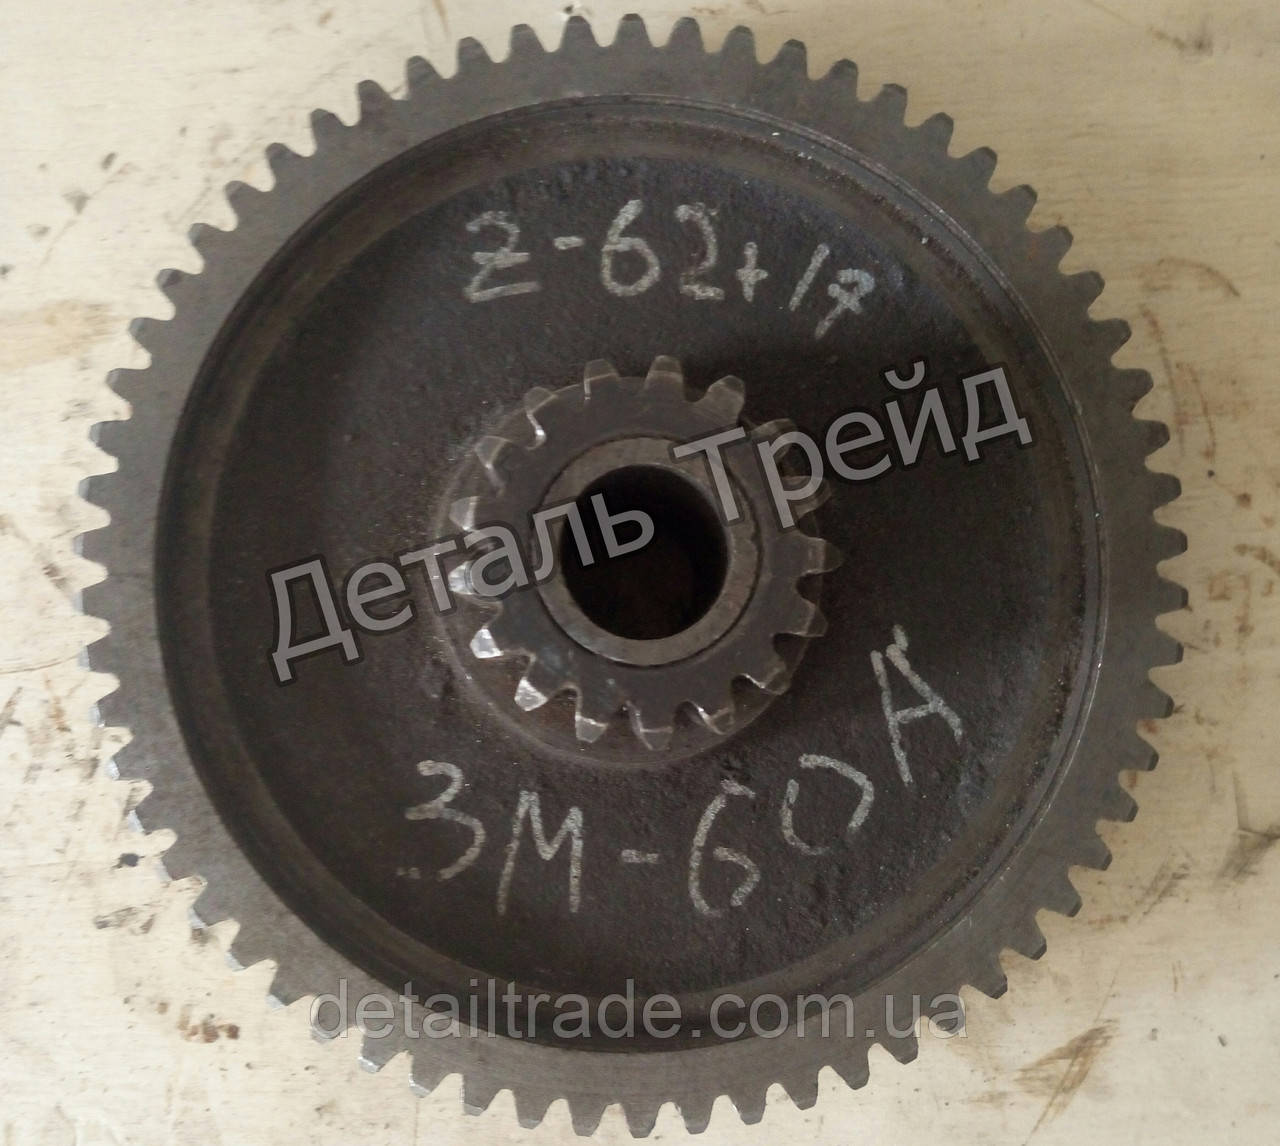 Блок зубчатый Z 62+Z 17 для зернометателя ЗМ-60А